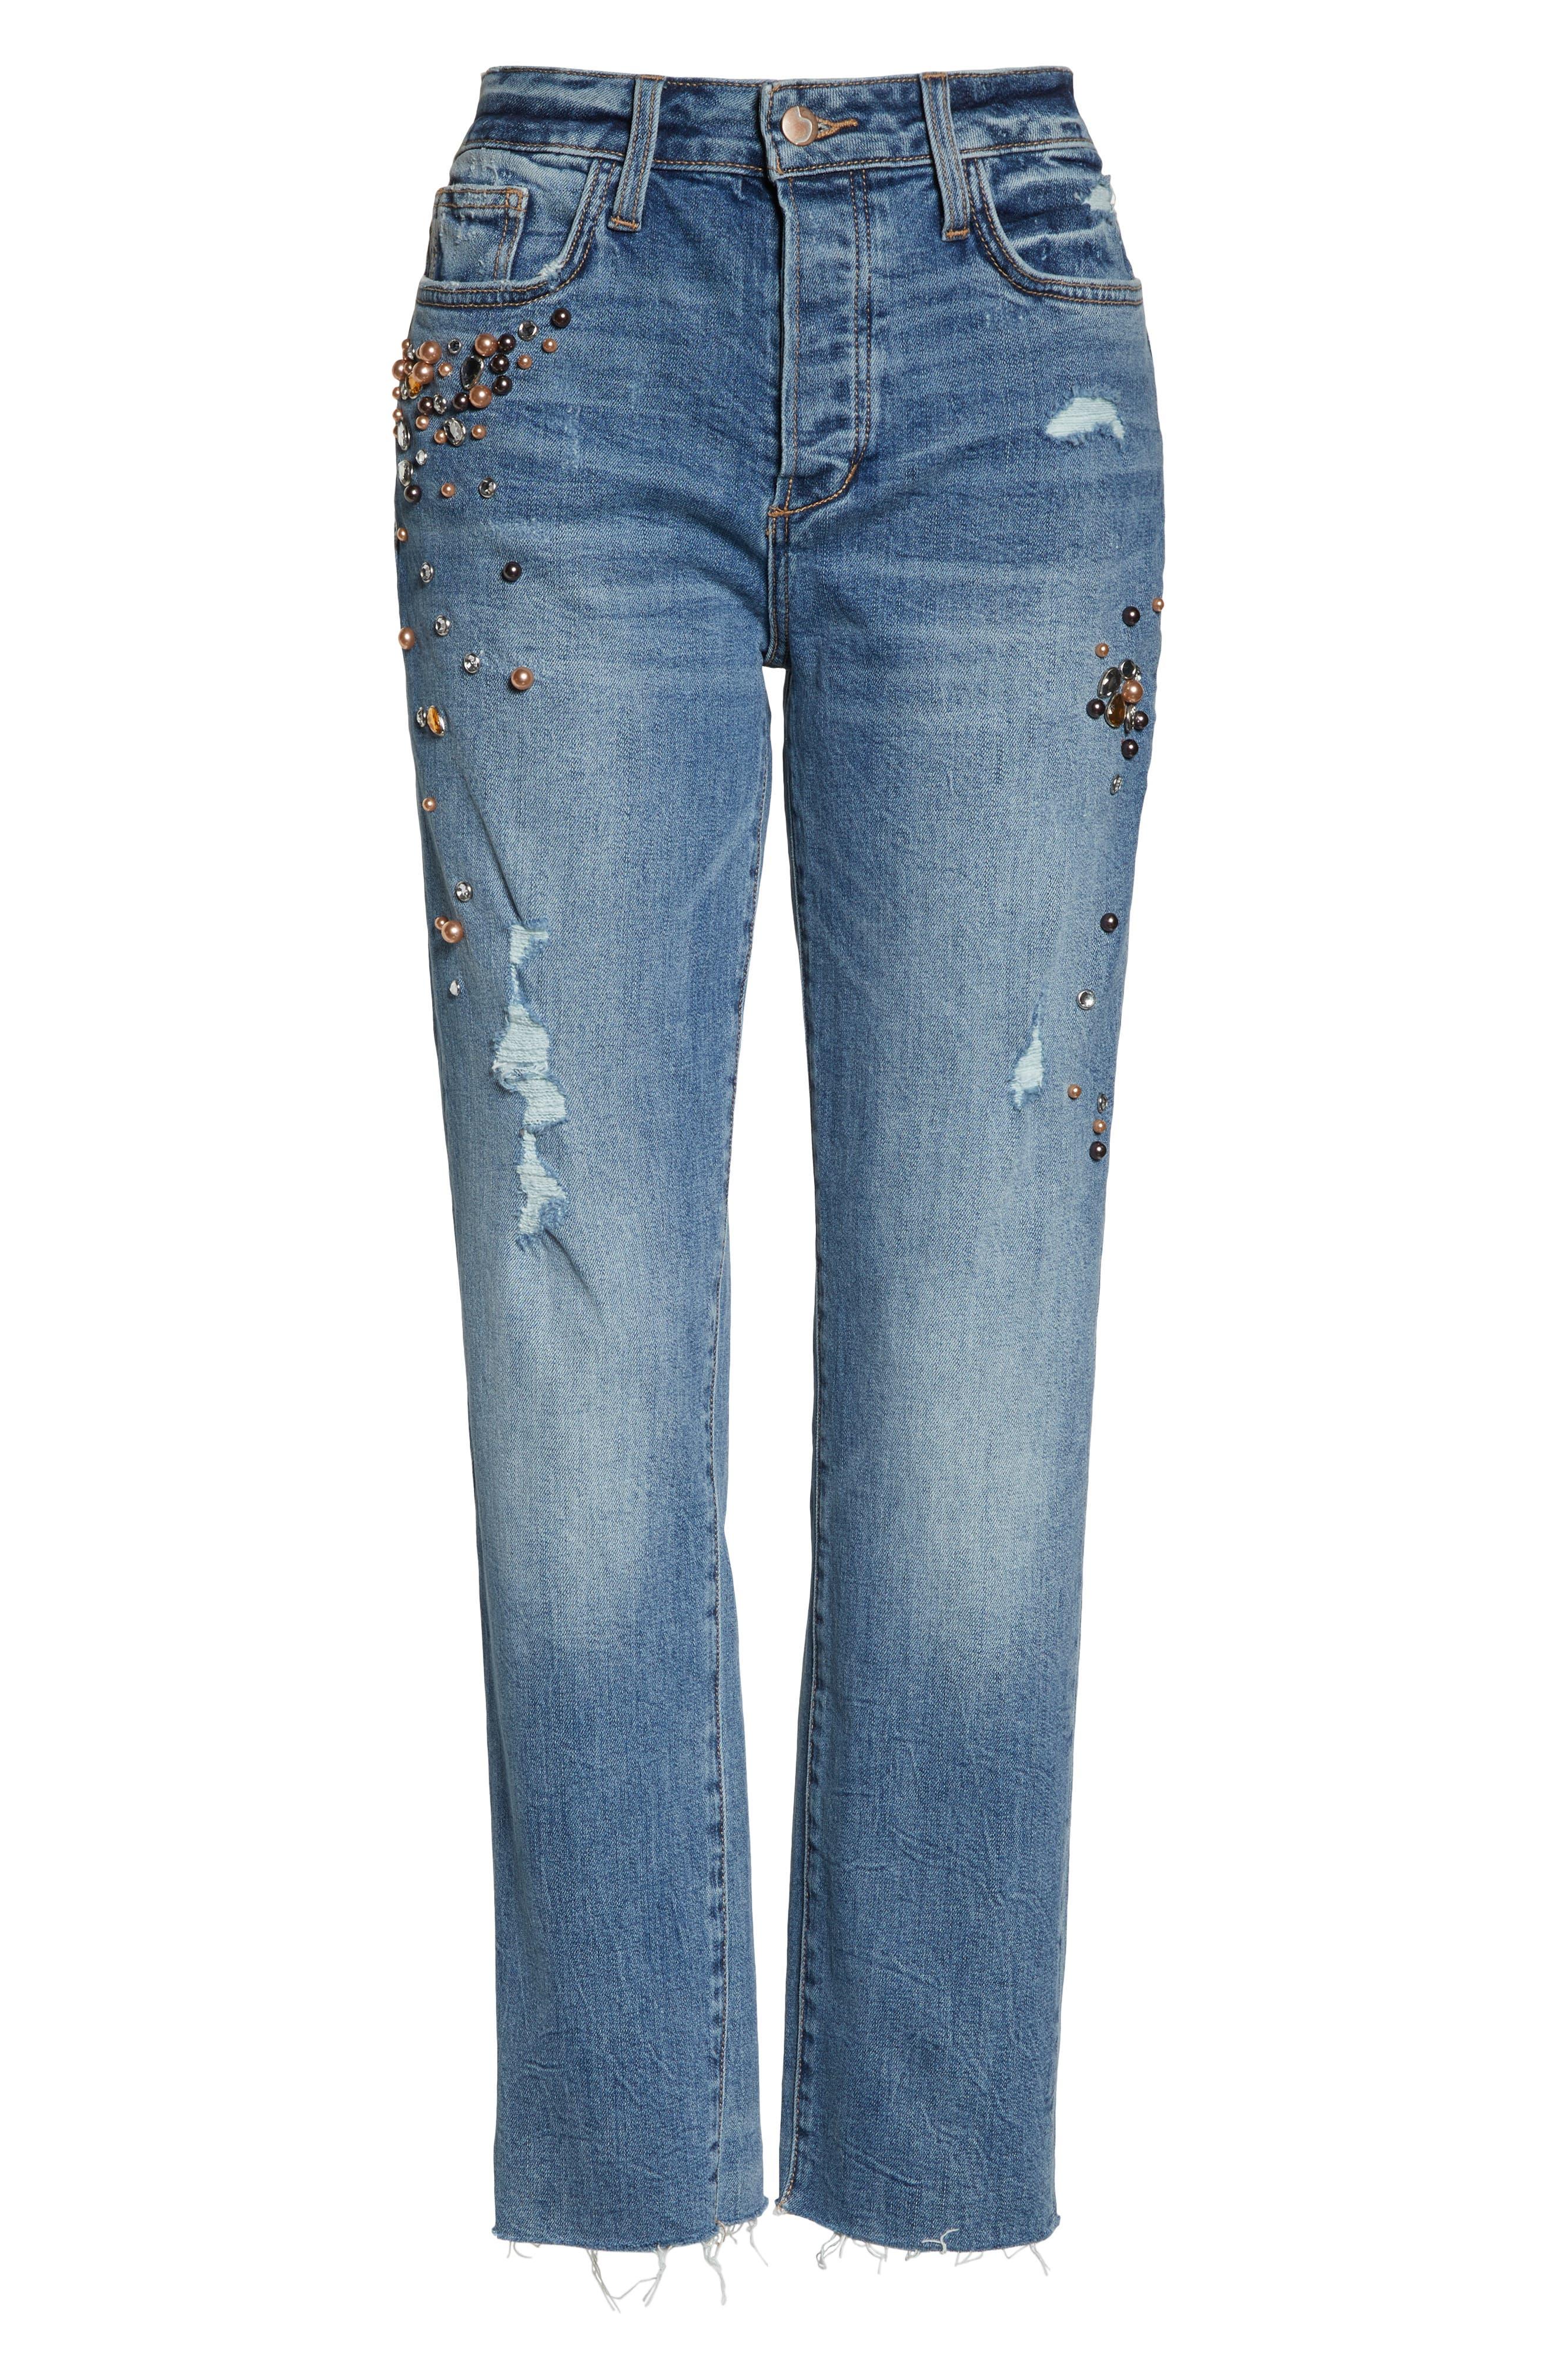 Smith Embellished High Waist Raw Hem Ankle Boyfriend Jeans,                             Alternate thumbnail 4, color,                             SHEYENNE